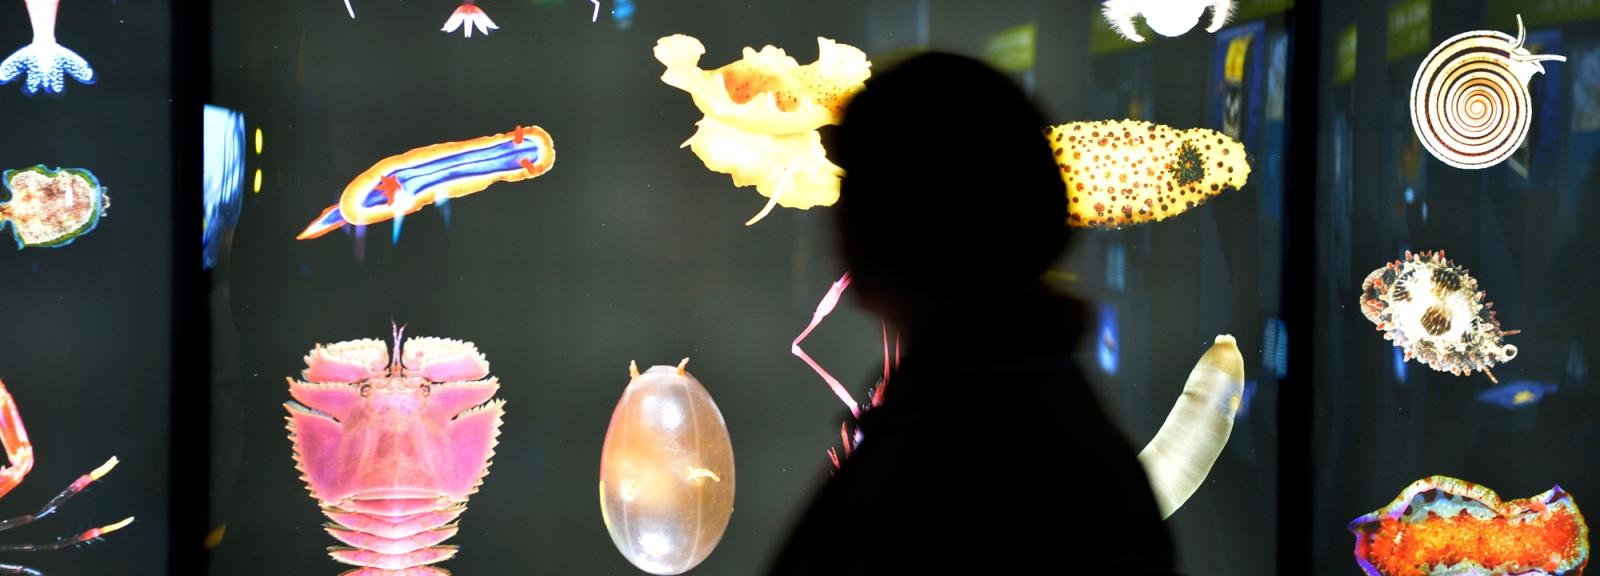 Exposition Océan, une plongée insolite © MNHN - JC Domenech